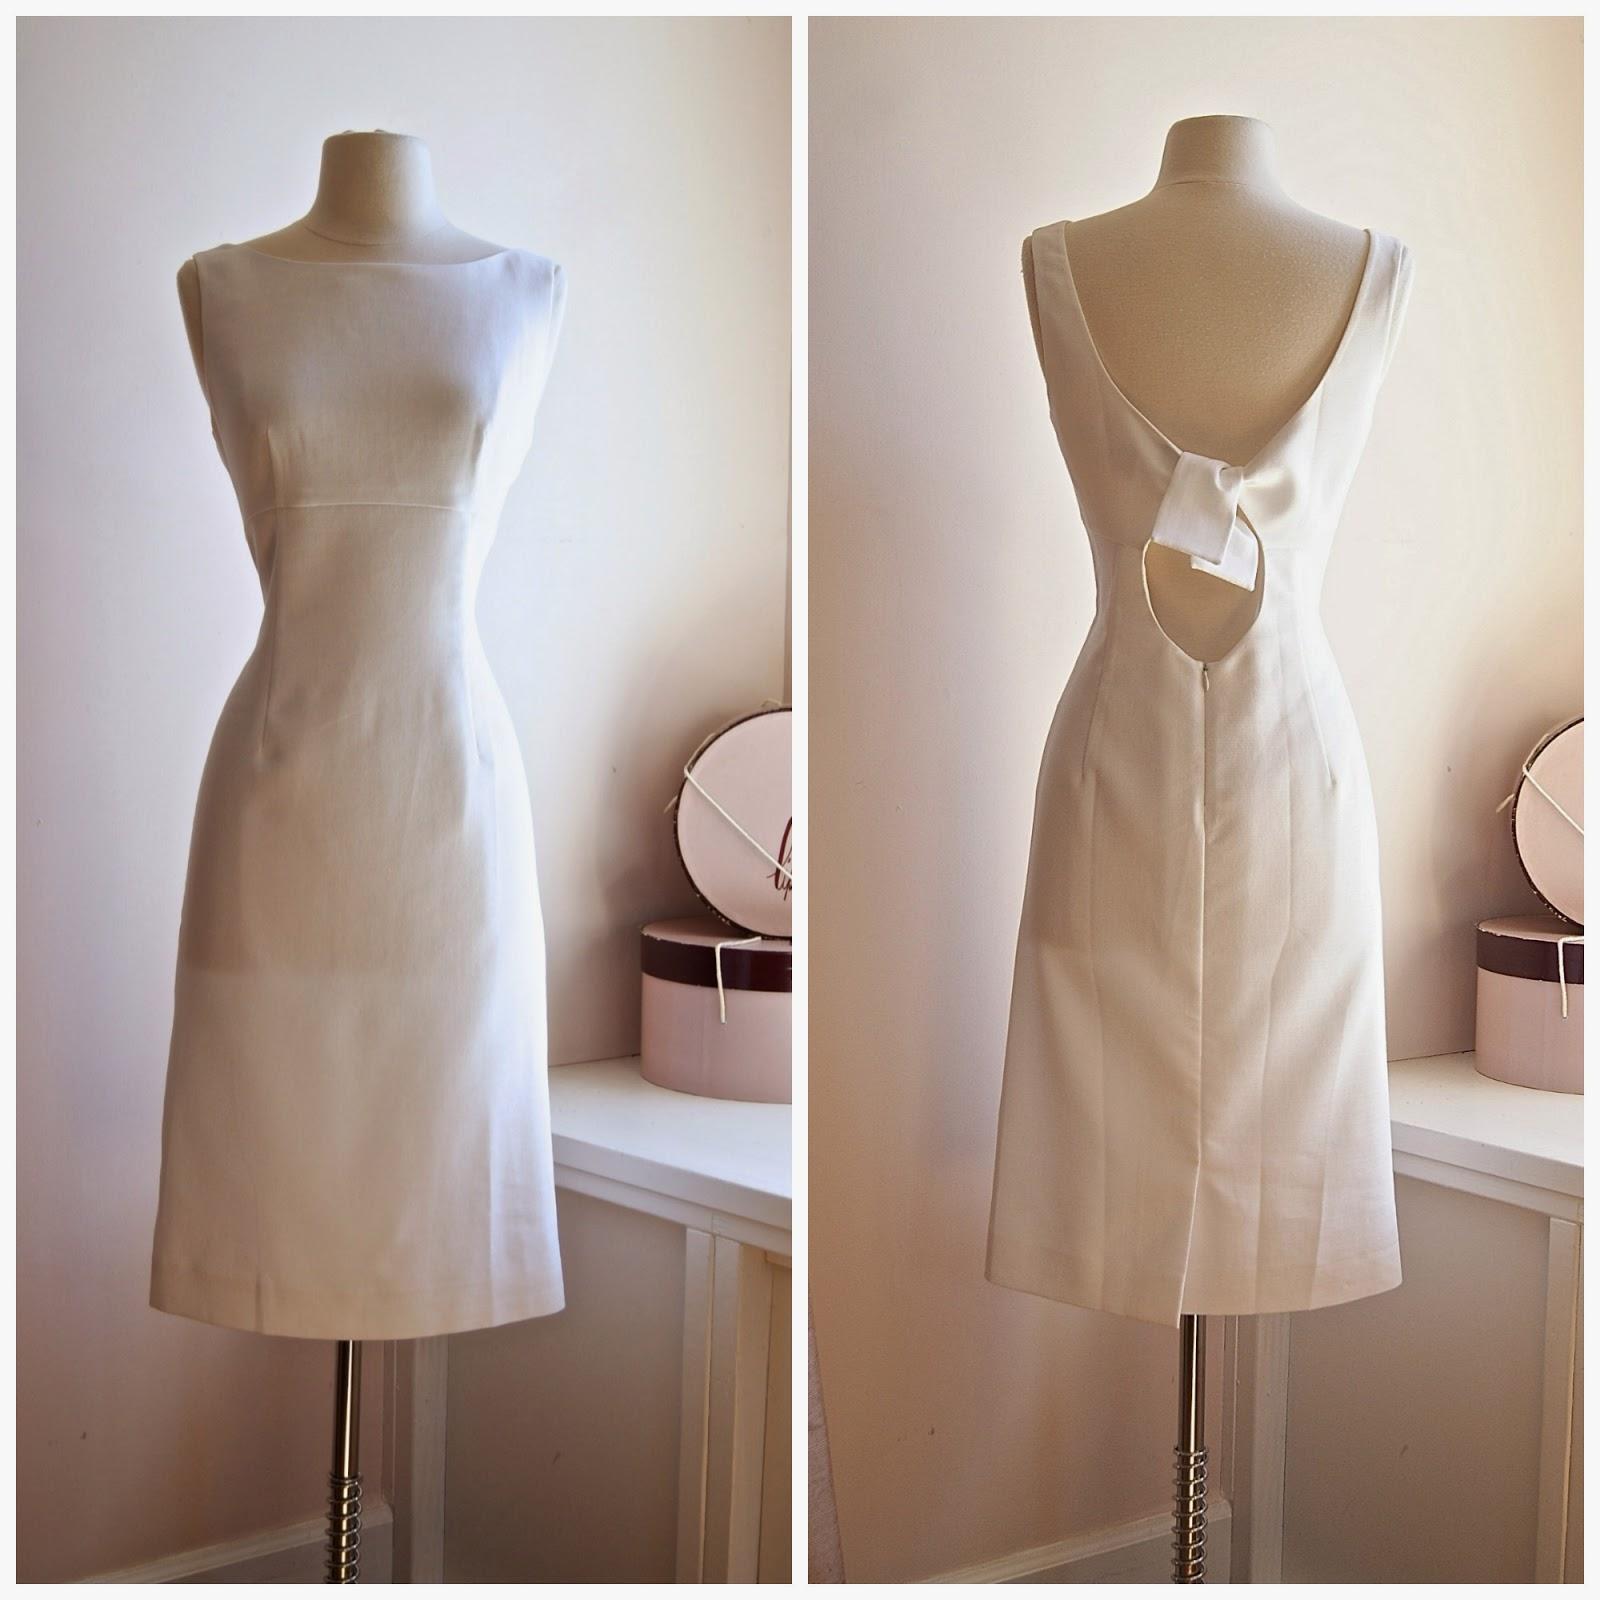 Vintage Wedding Dresses Bay Area: Xtabay Vintage Clothing Boutique